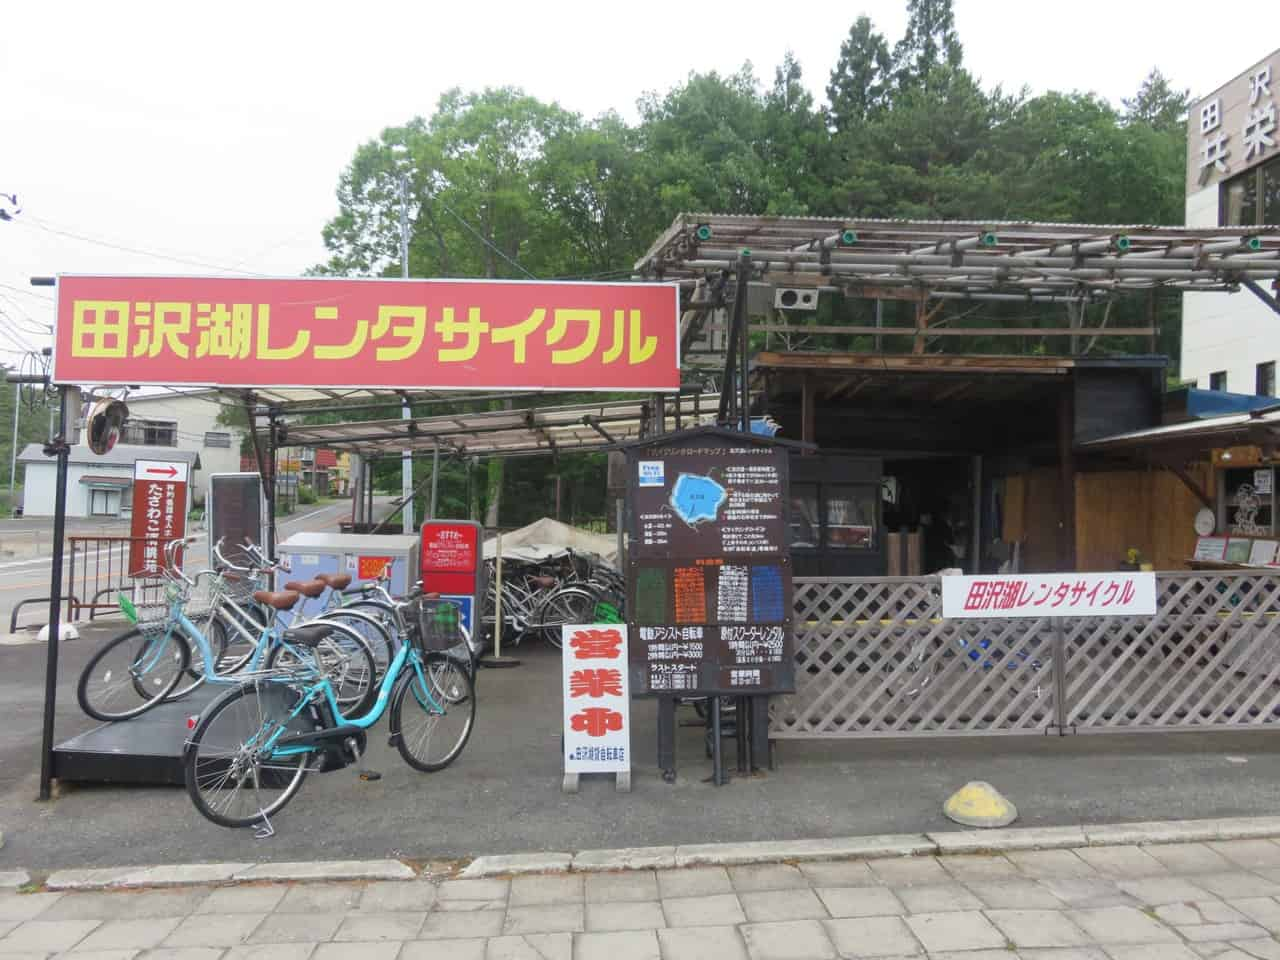 Lugar para alquilar bicicletas en Tazawako